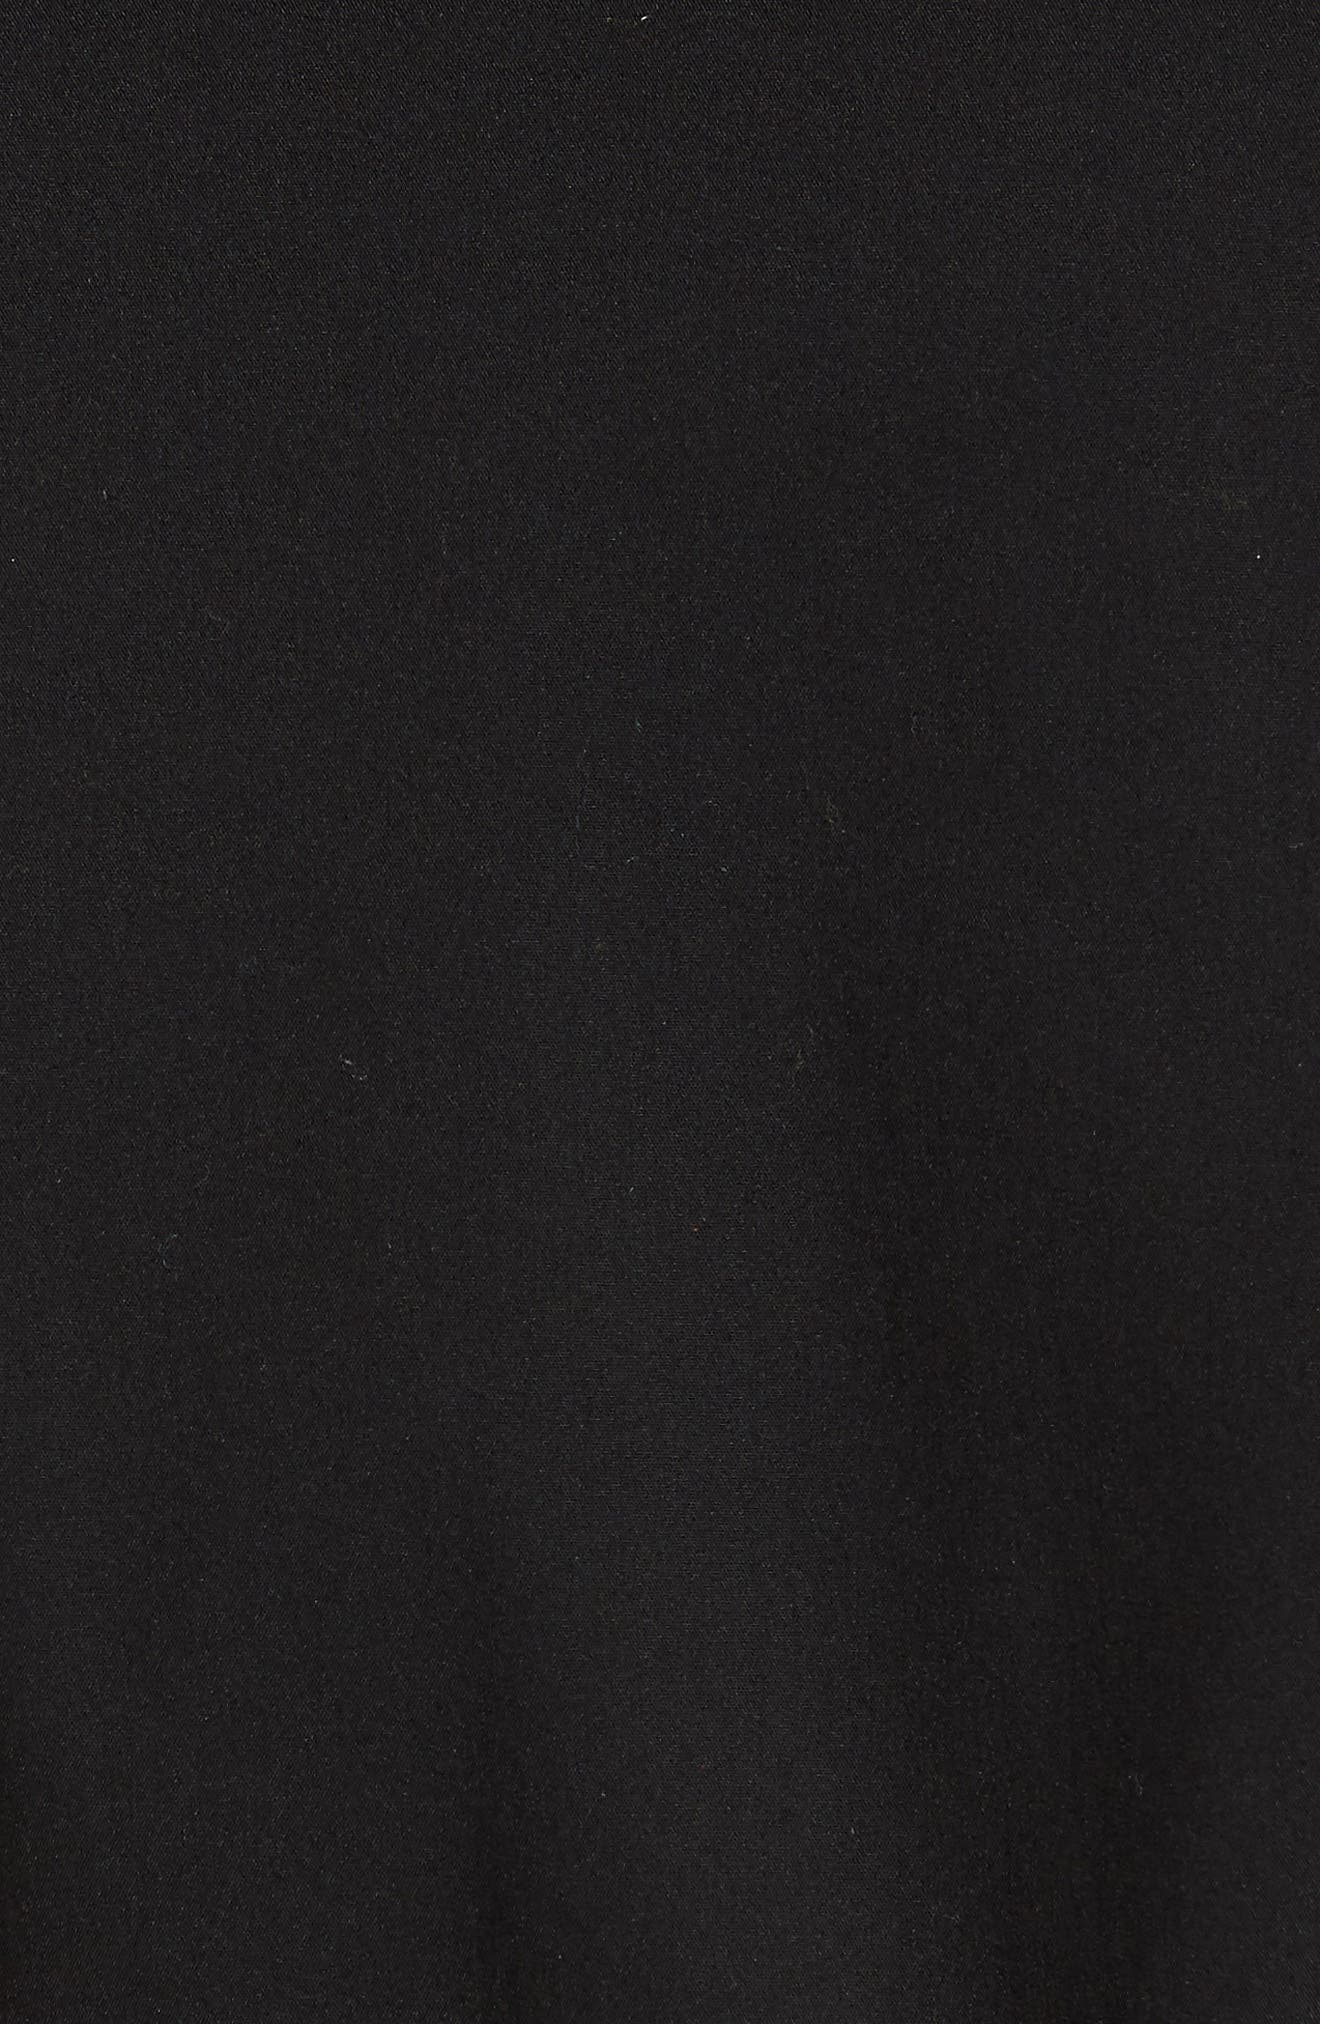 Stretch Cotton Poplin Shirtdress,                             Alternate thumbnail 6, color,                             001